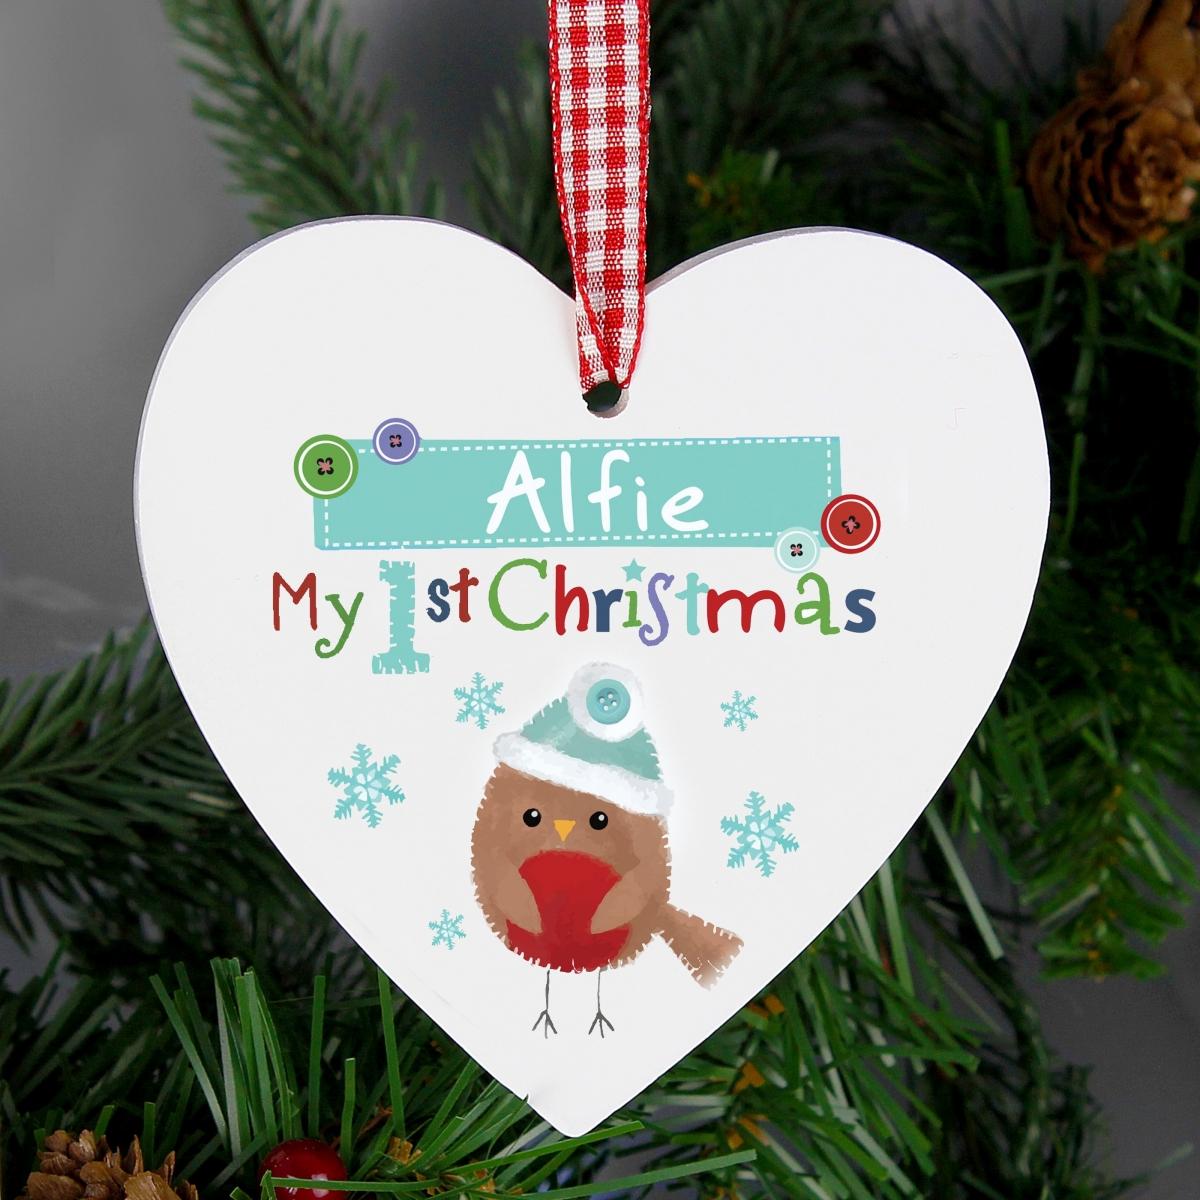 Personalised Felt Stitch Robin 'My 1st Christmas' Wooden Heart Decoration & Keepsake